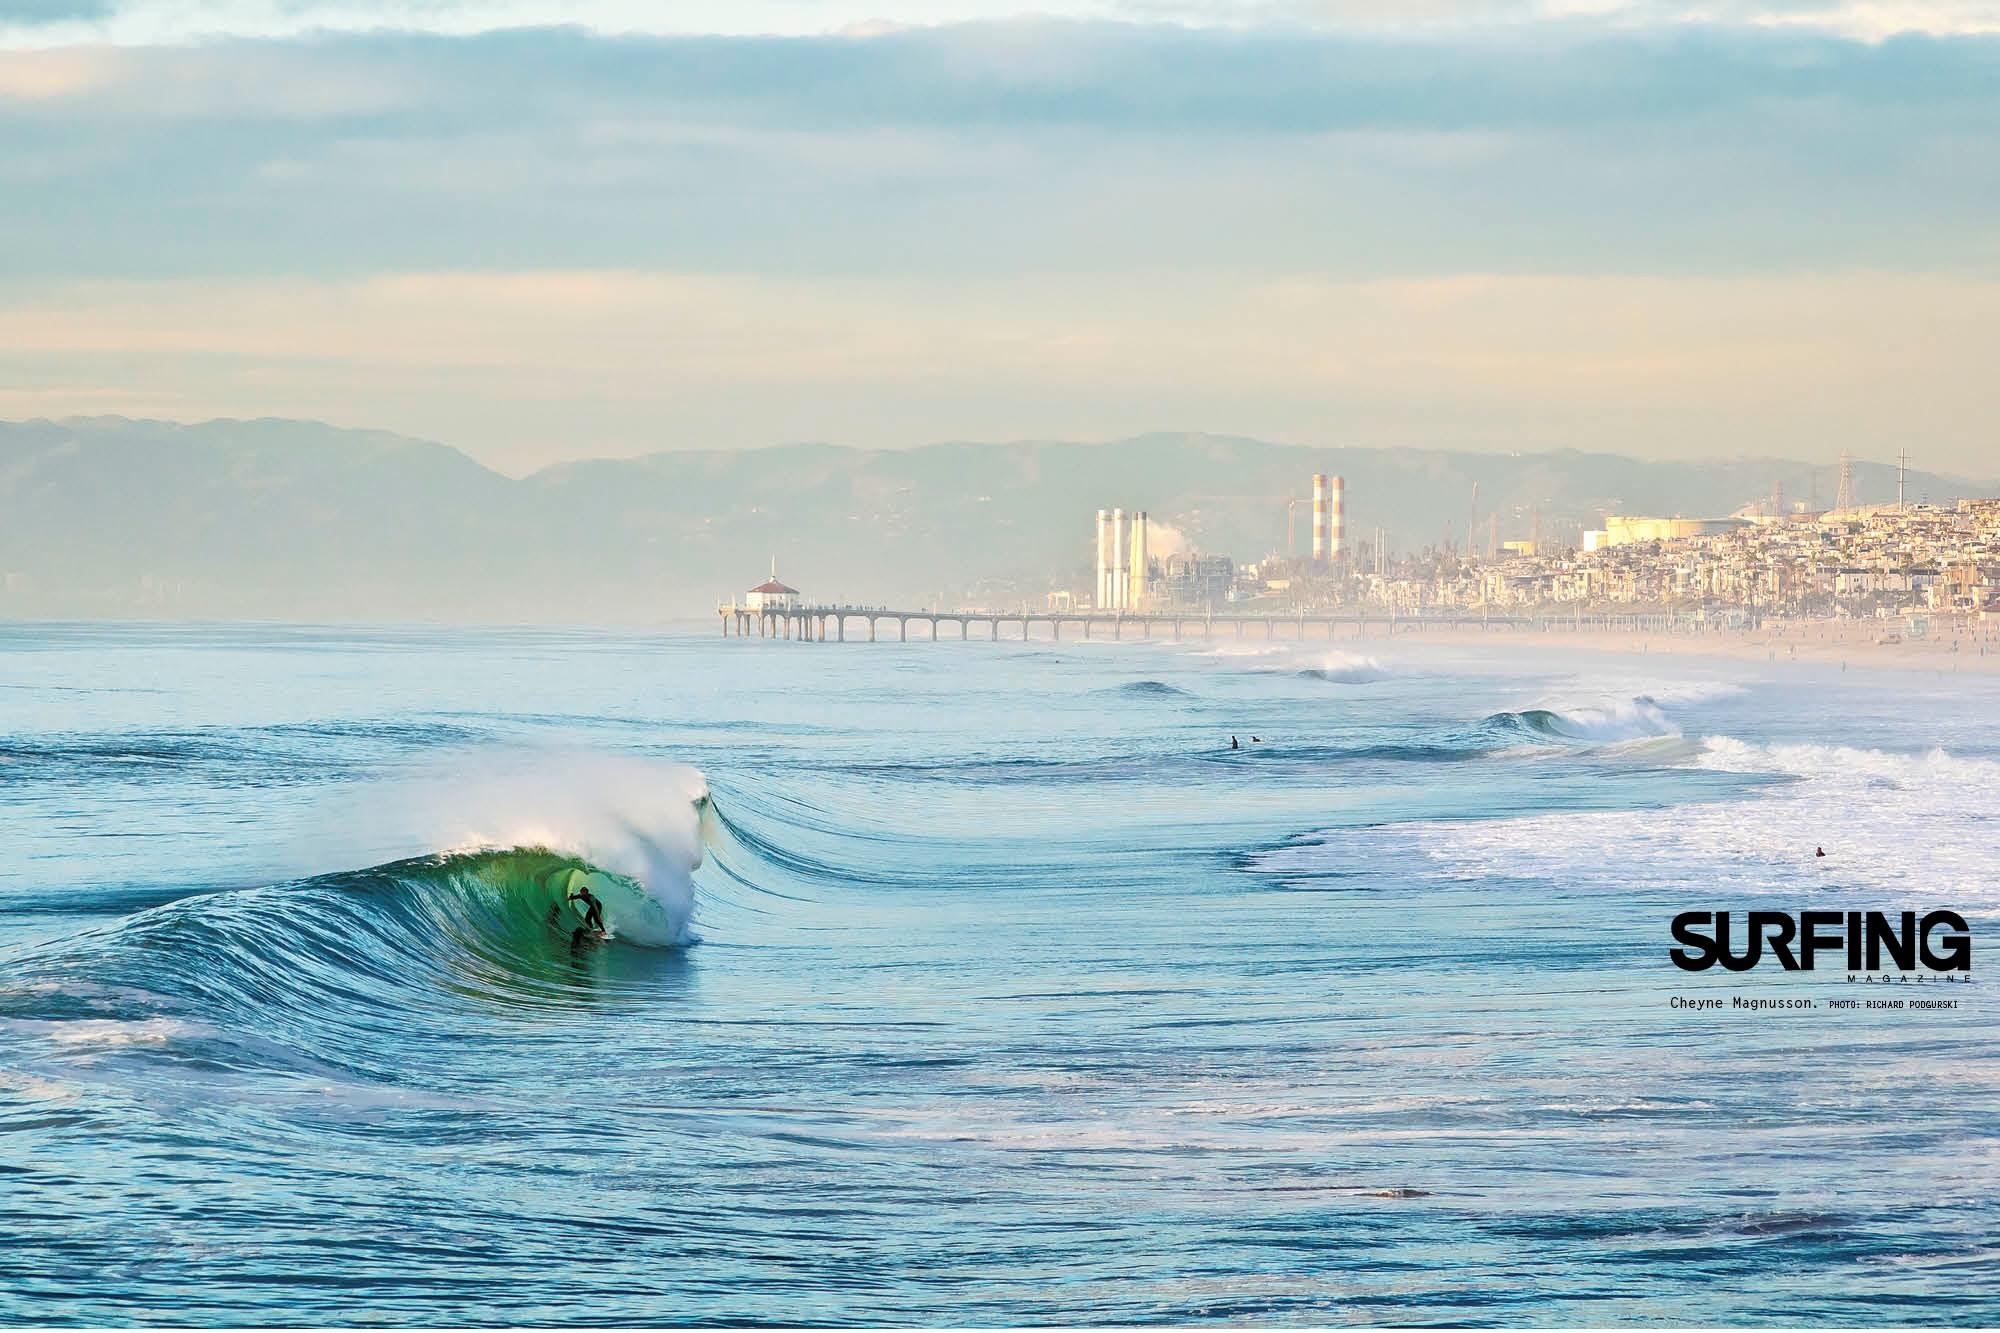 surfer magazine wallpaper …